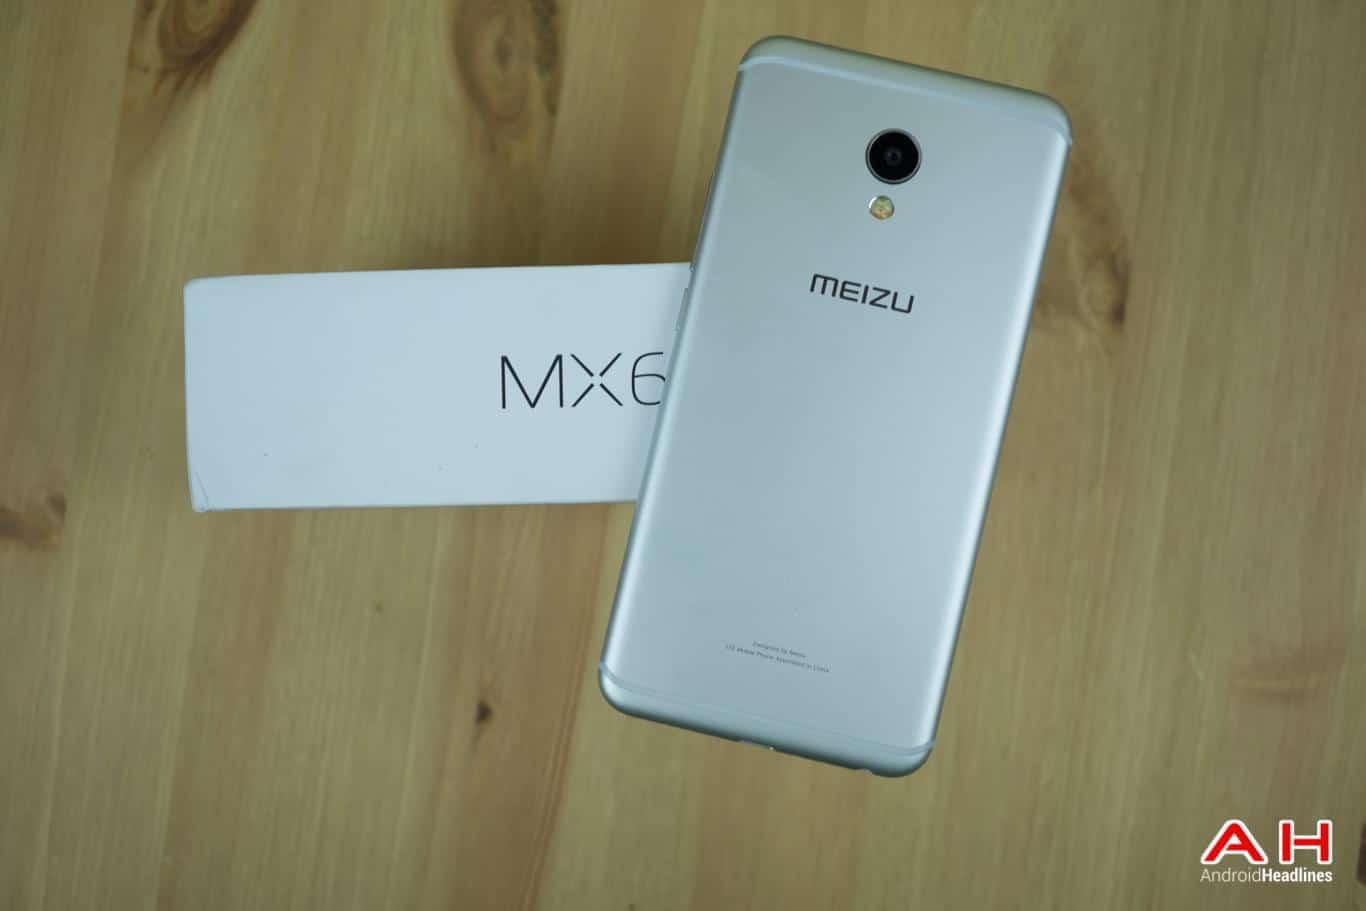 meizu-mx6-ah-2